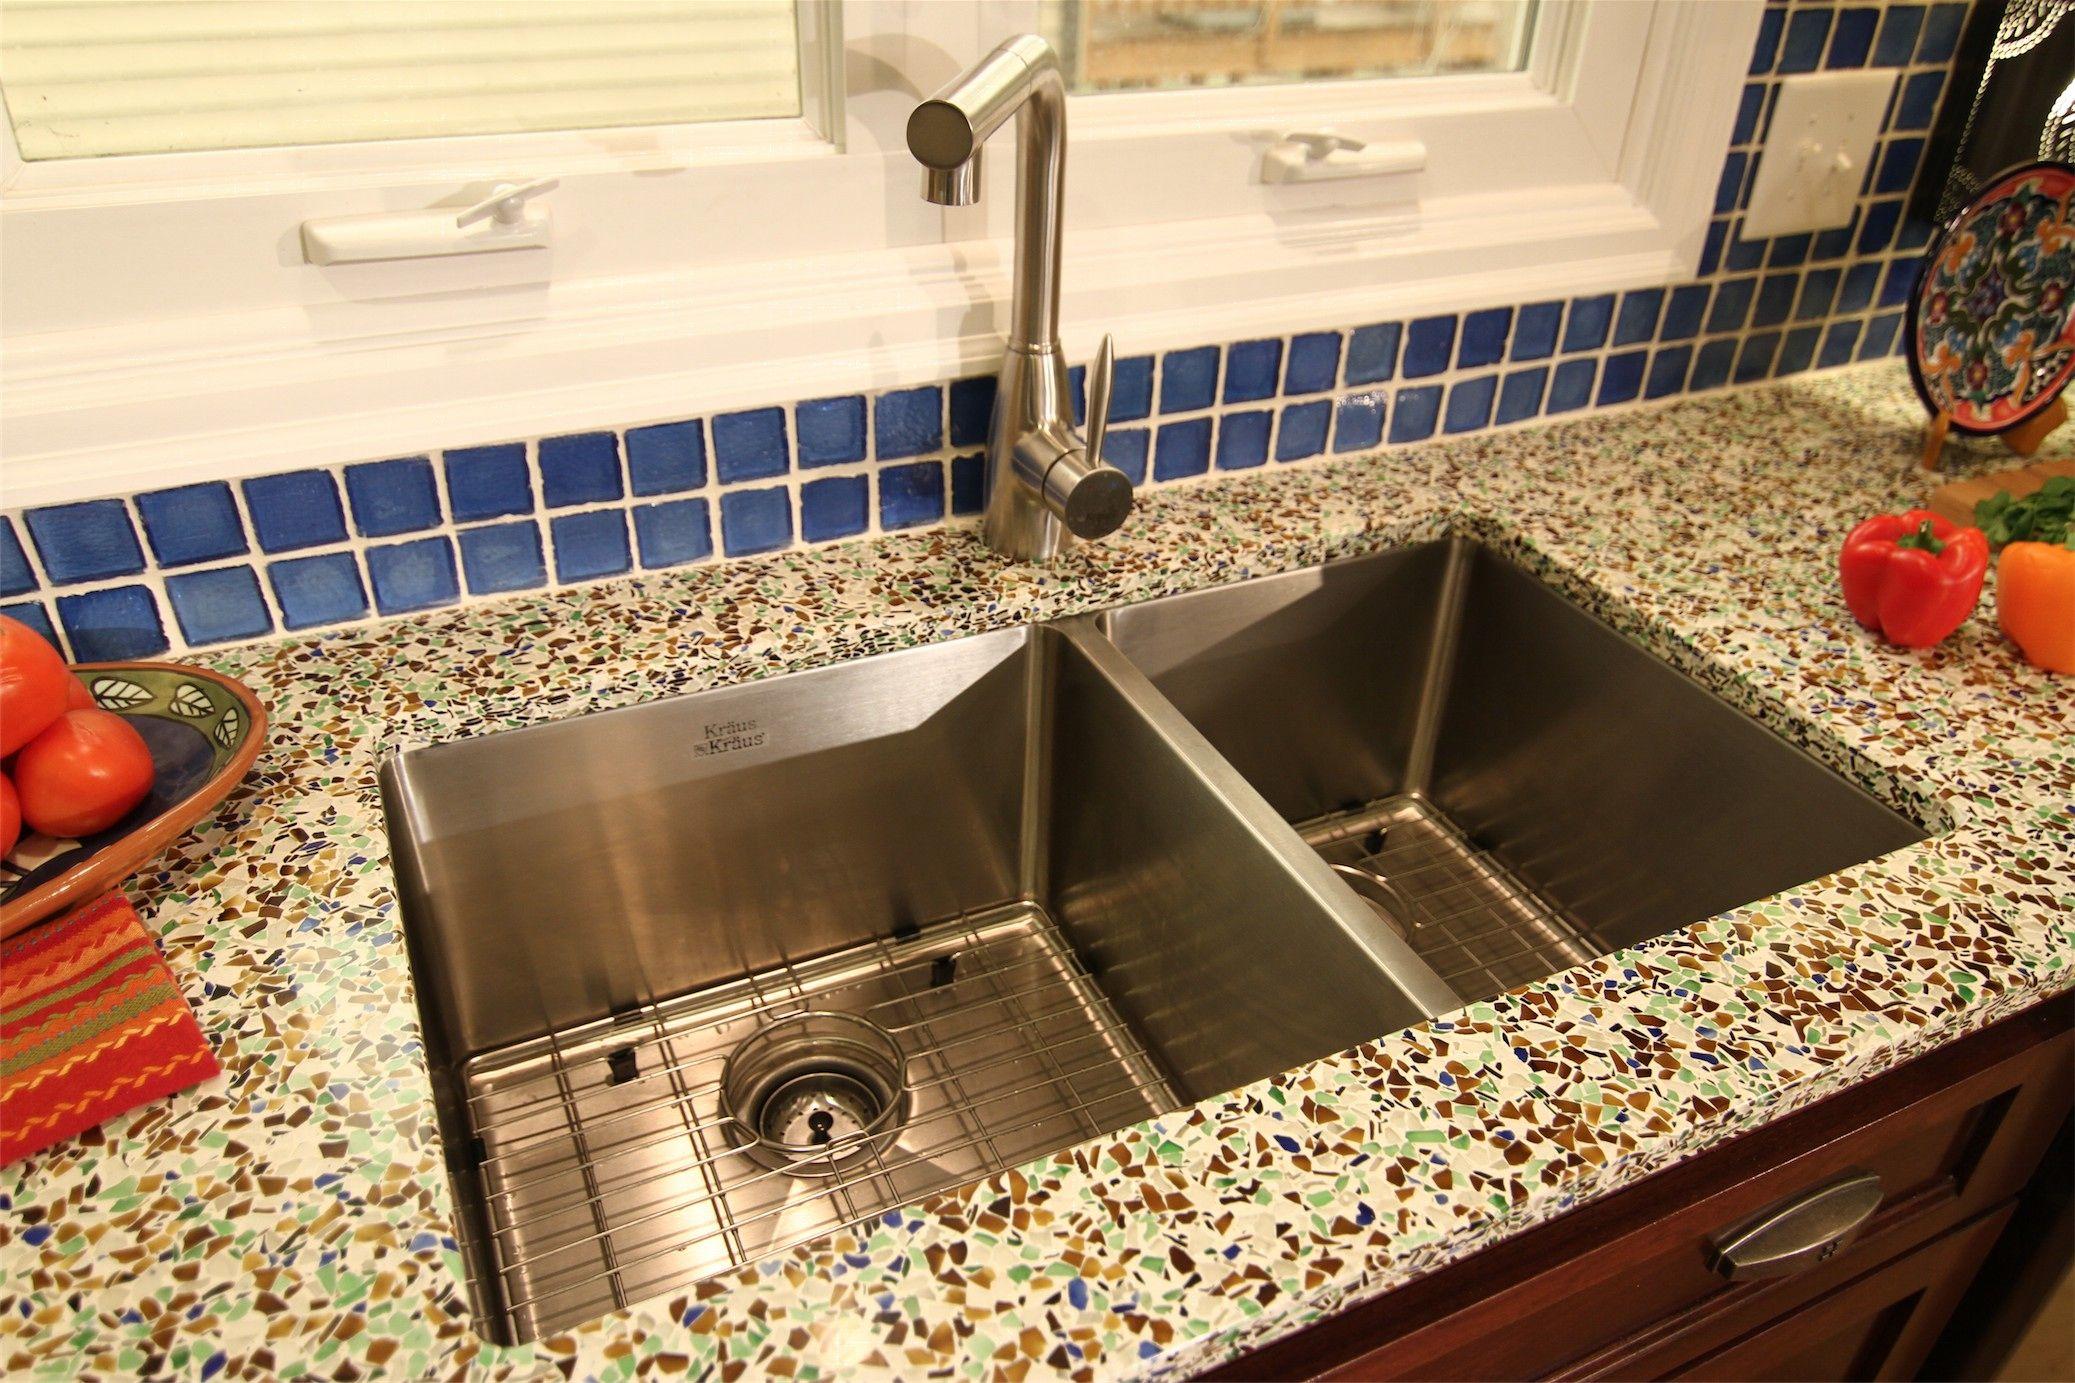 Diy Tile Kitchen Countertops 1000 Images About Countertops On Pinterest Diy Butcher Block